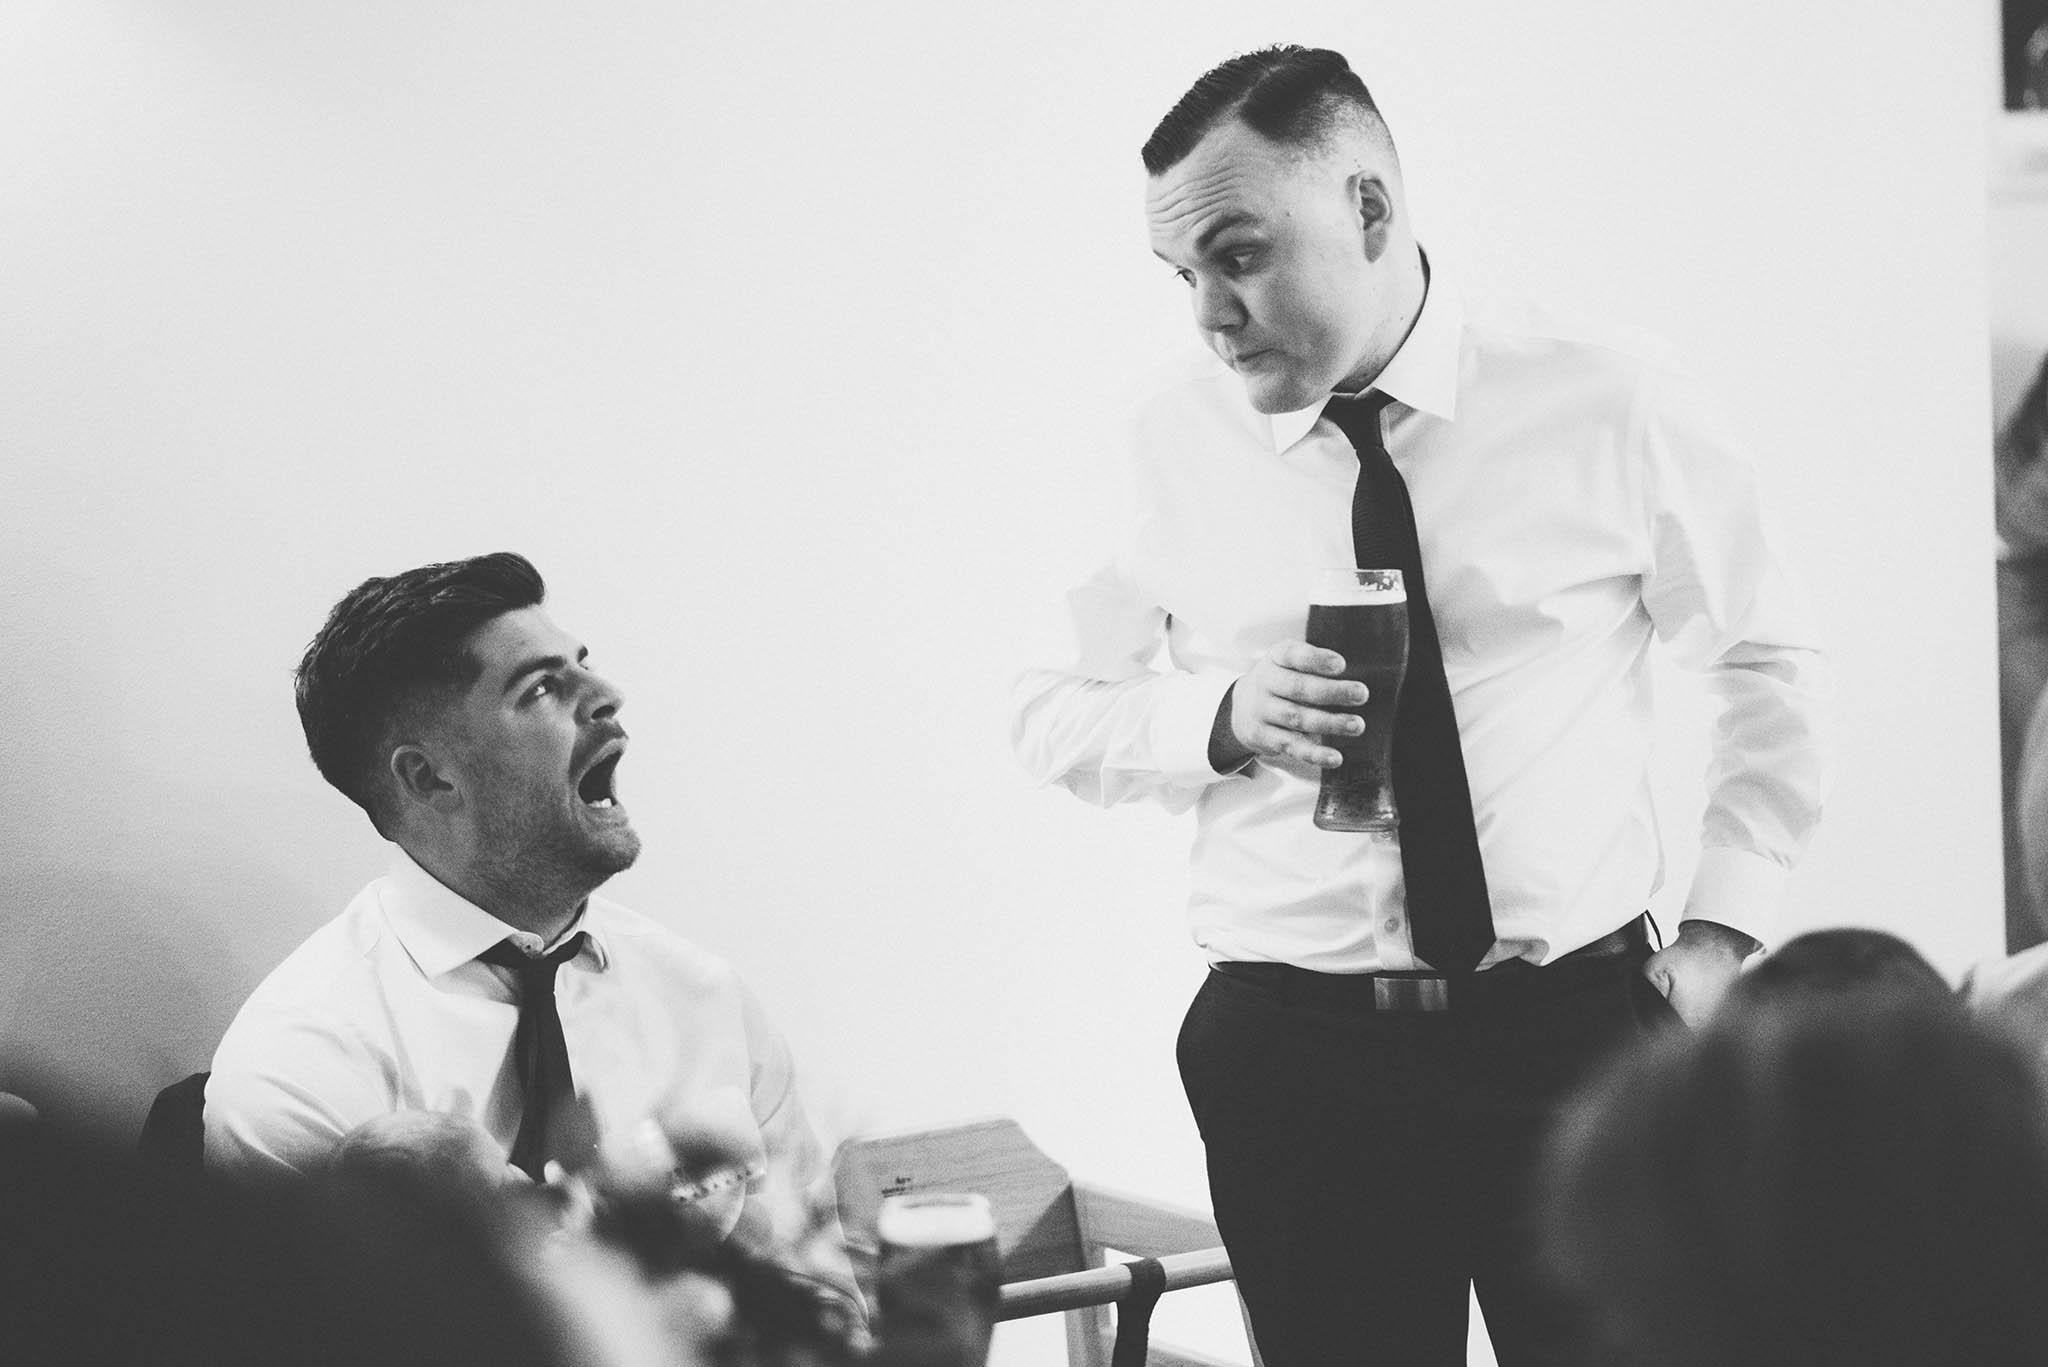 wedding-blog-scott-stockwell-photography-end-2017-yawn.jpg